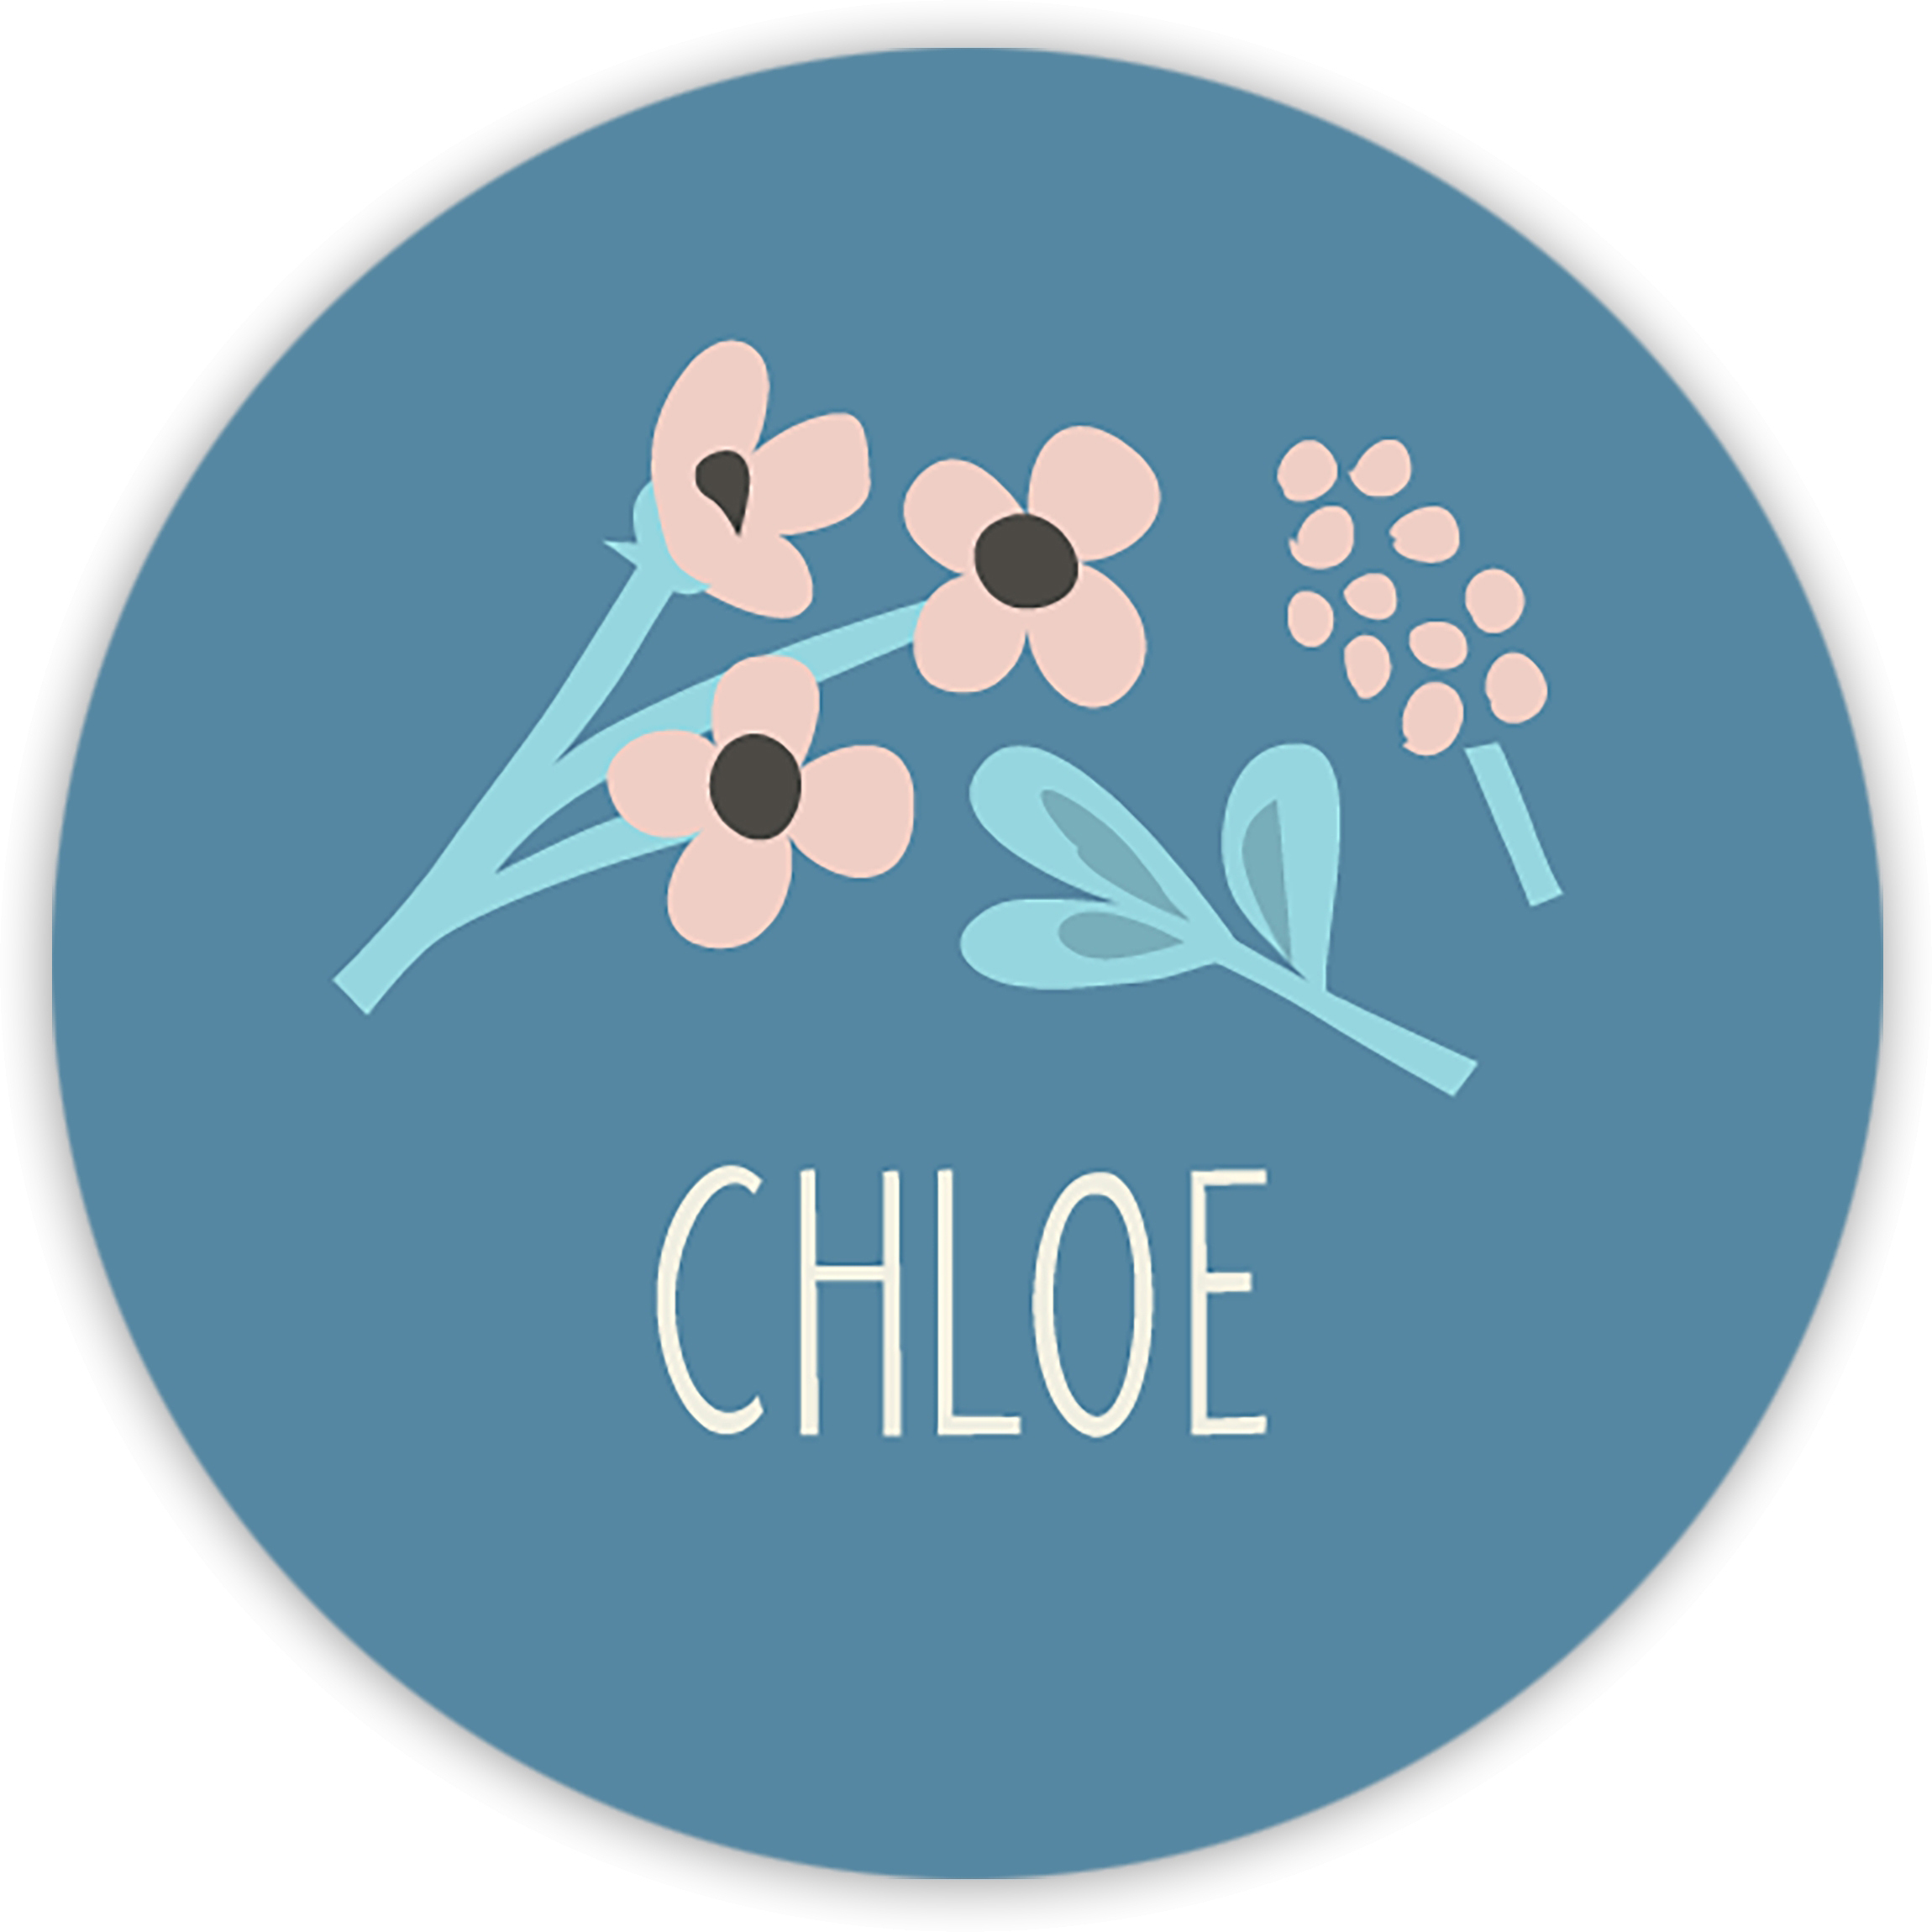 Thankful Florist - Personalized 1.75 Circle Seal Sticker